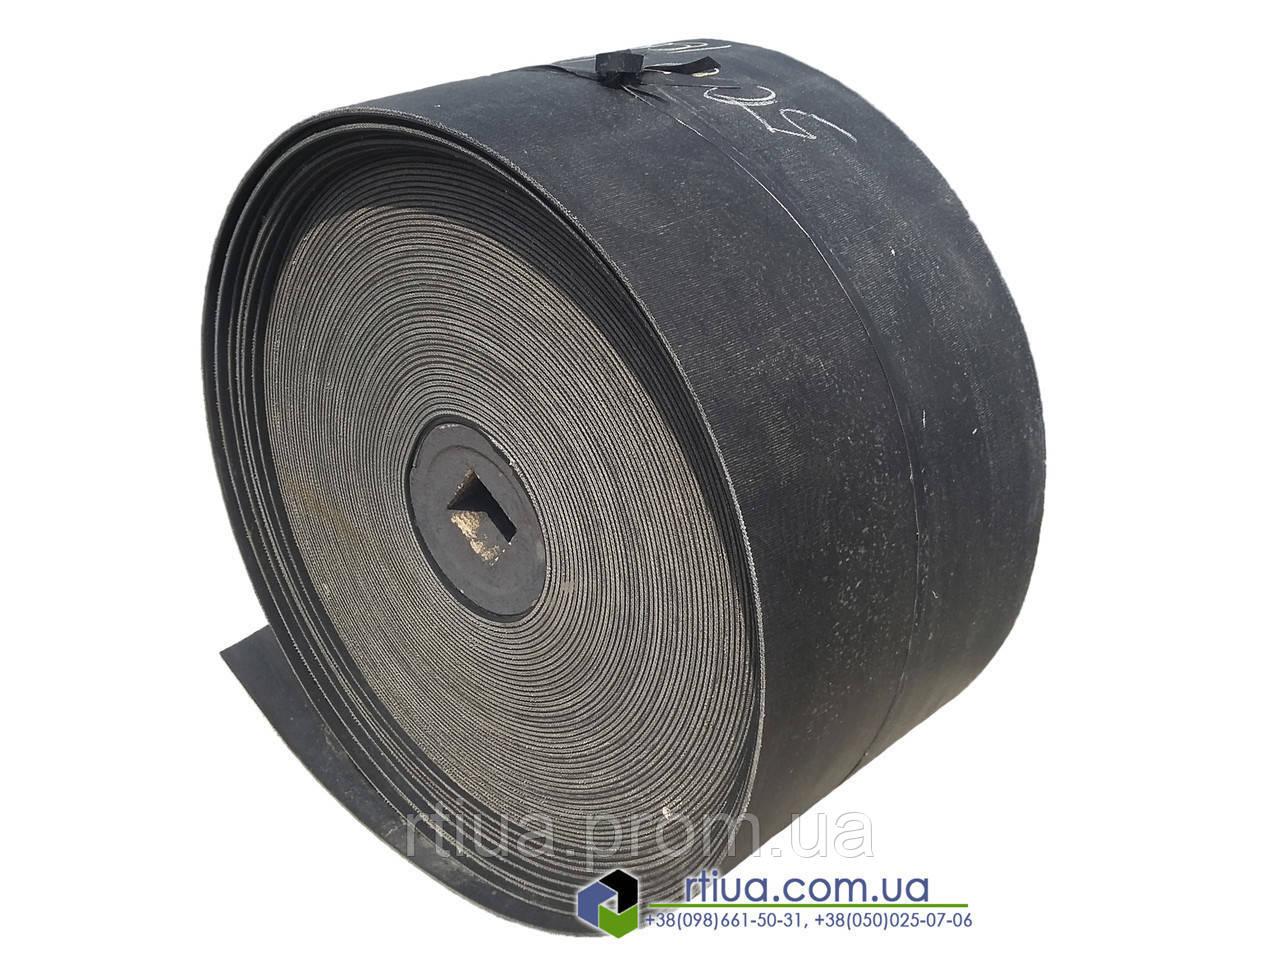 Конвейерная лента 1000х6 мм